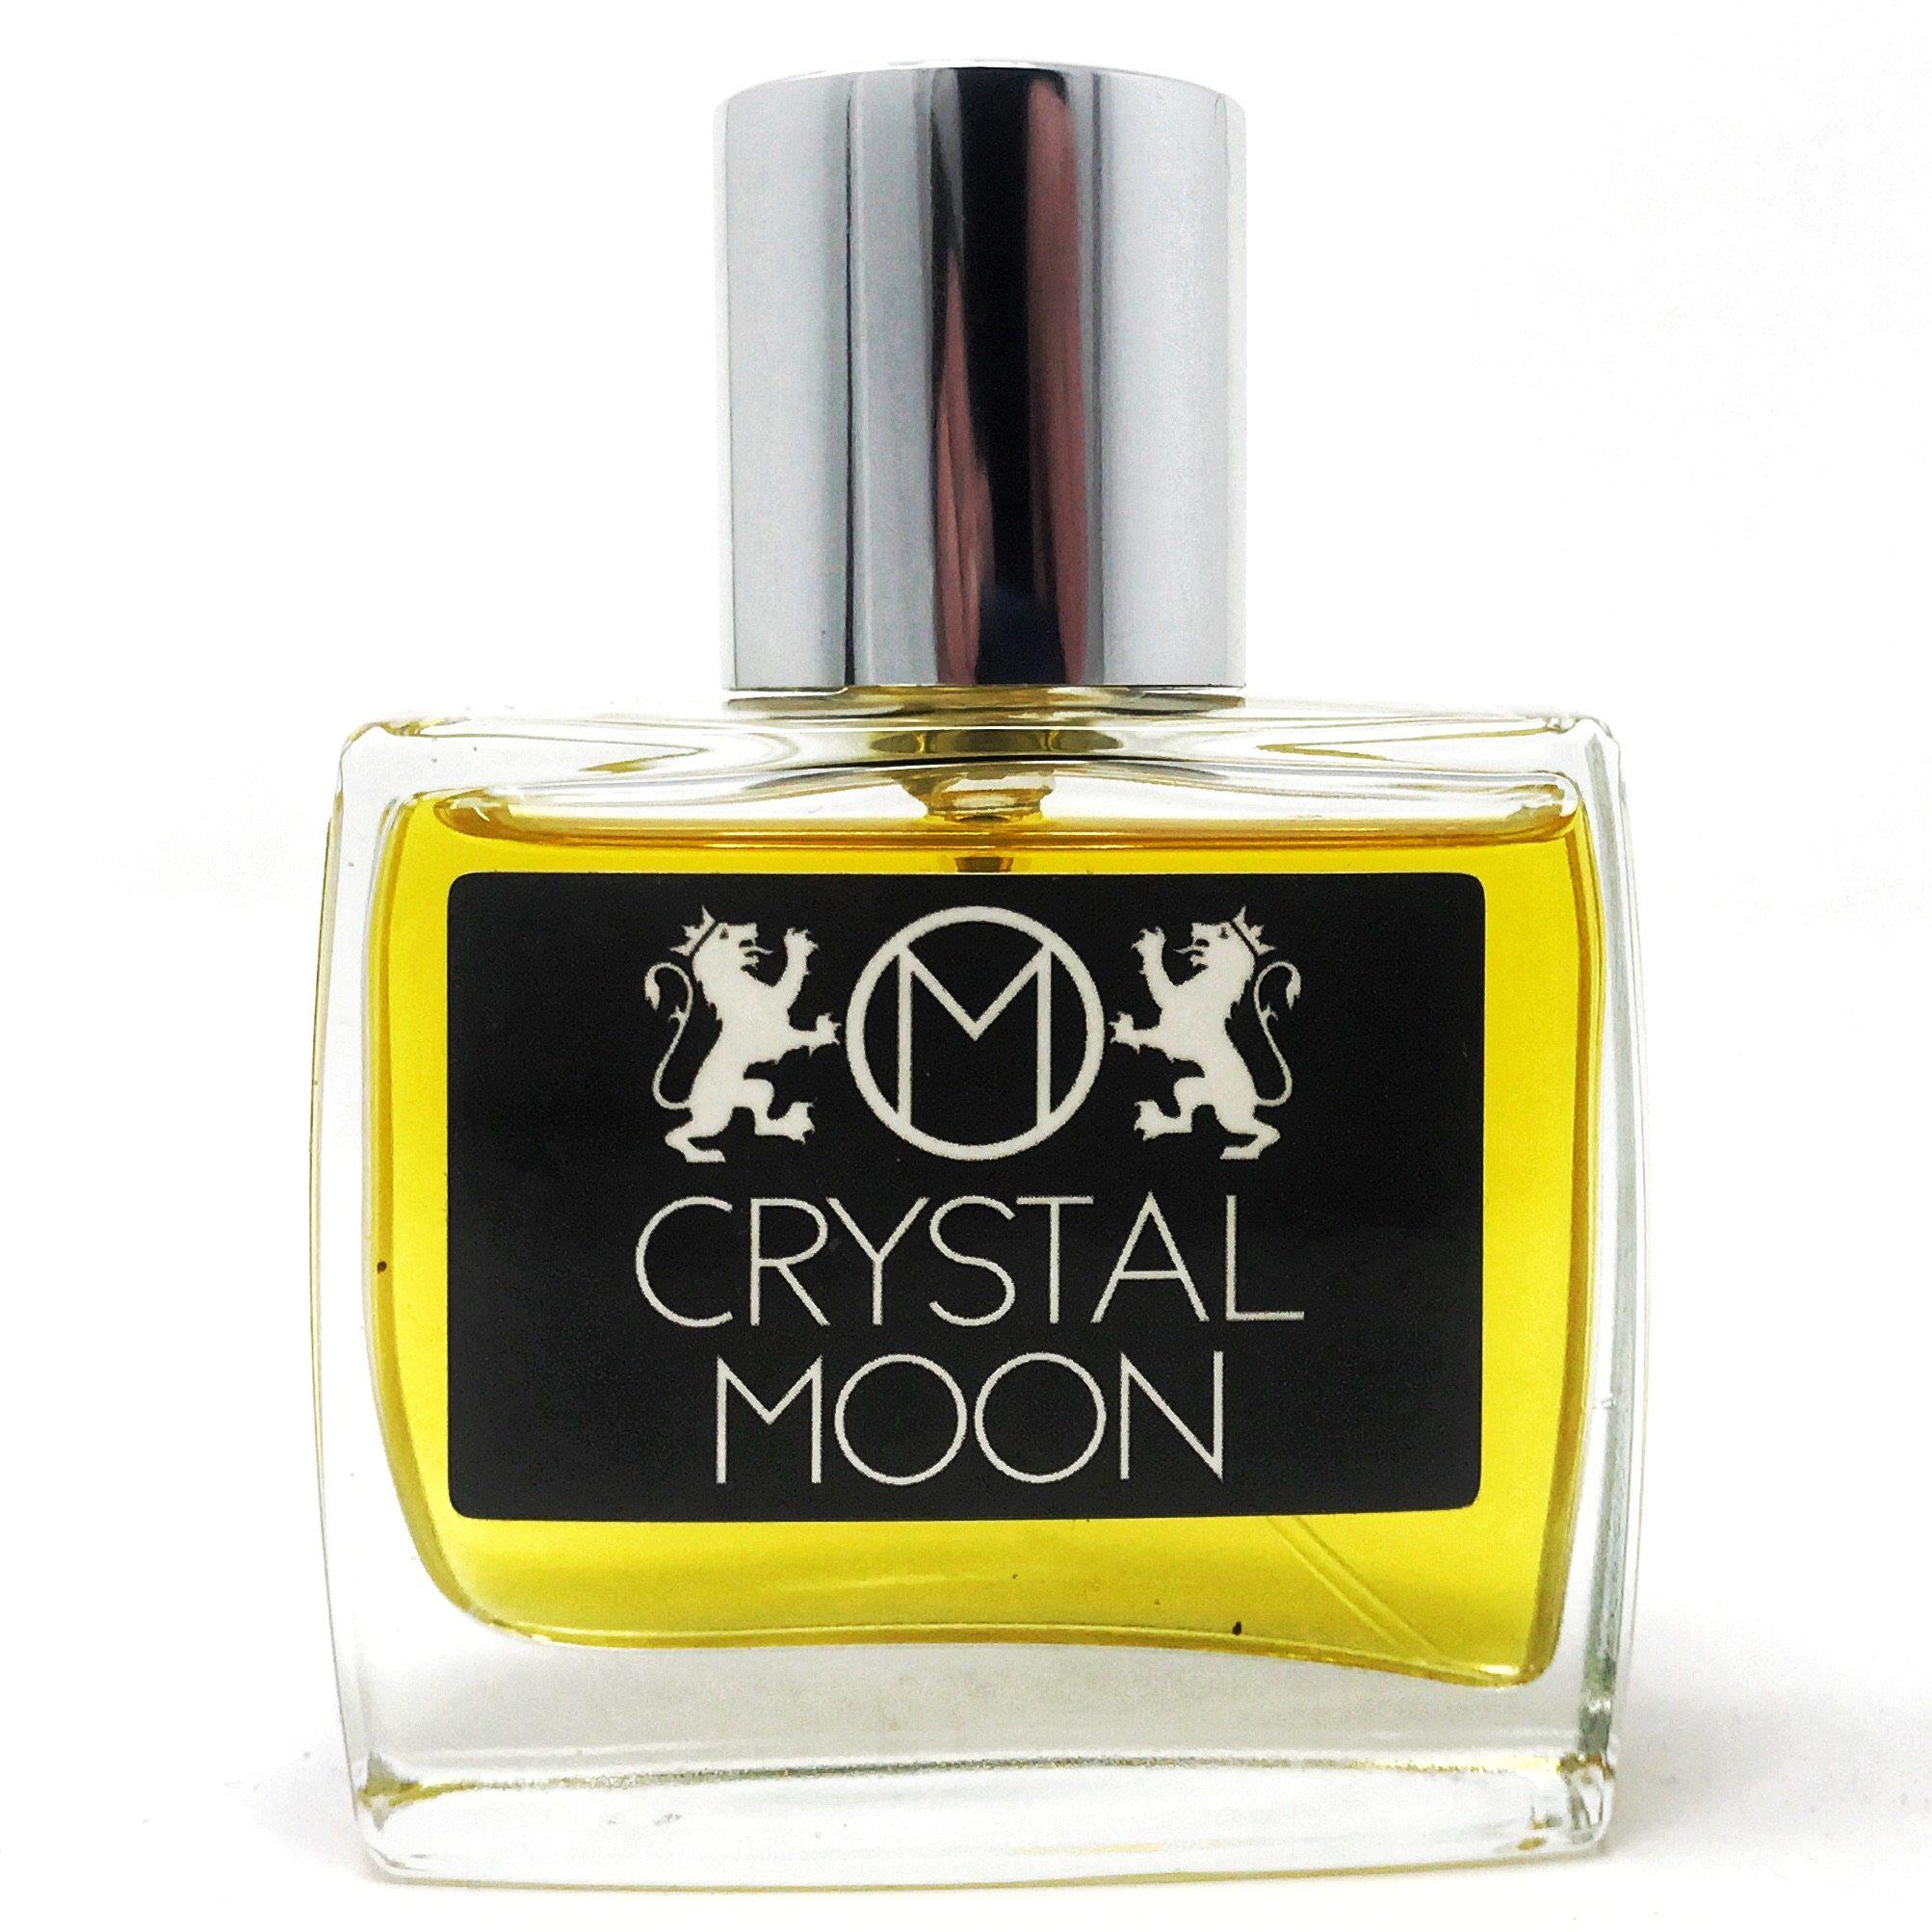 Maher Olfactive - Crystal Moon - Eau de Parfum image